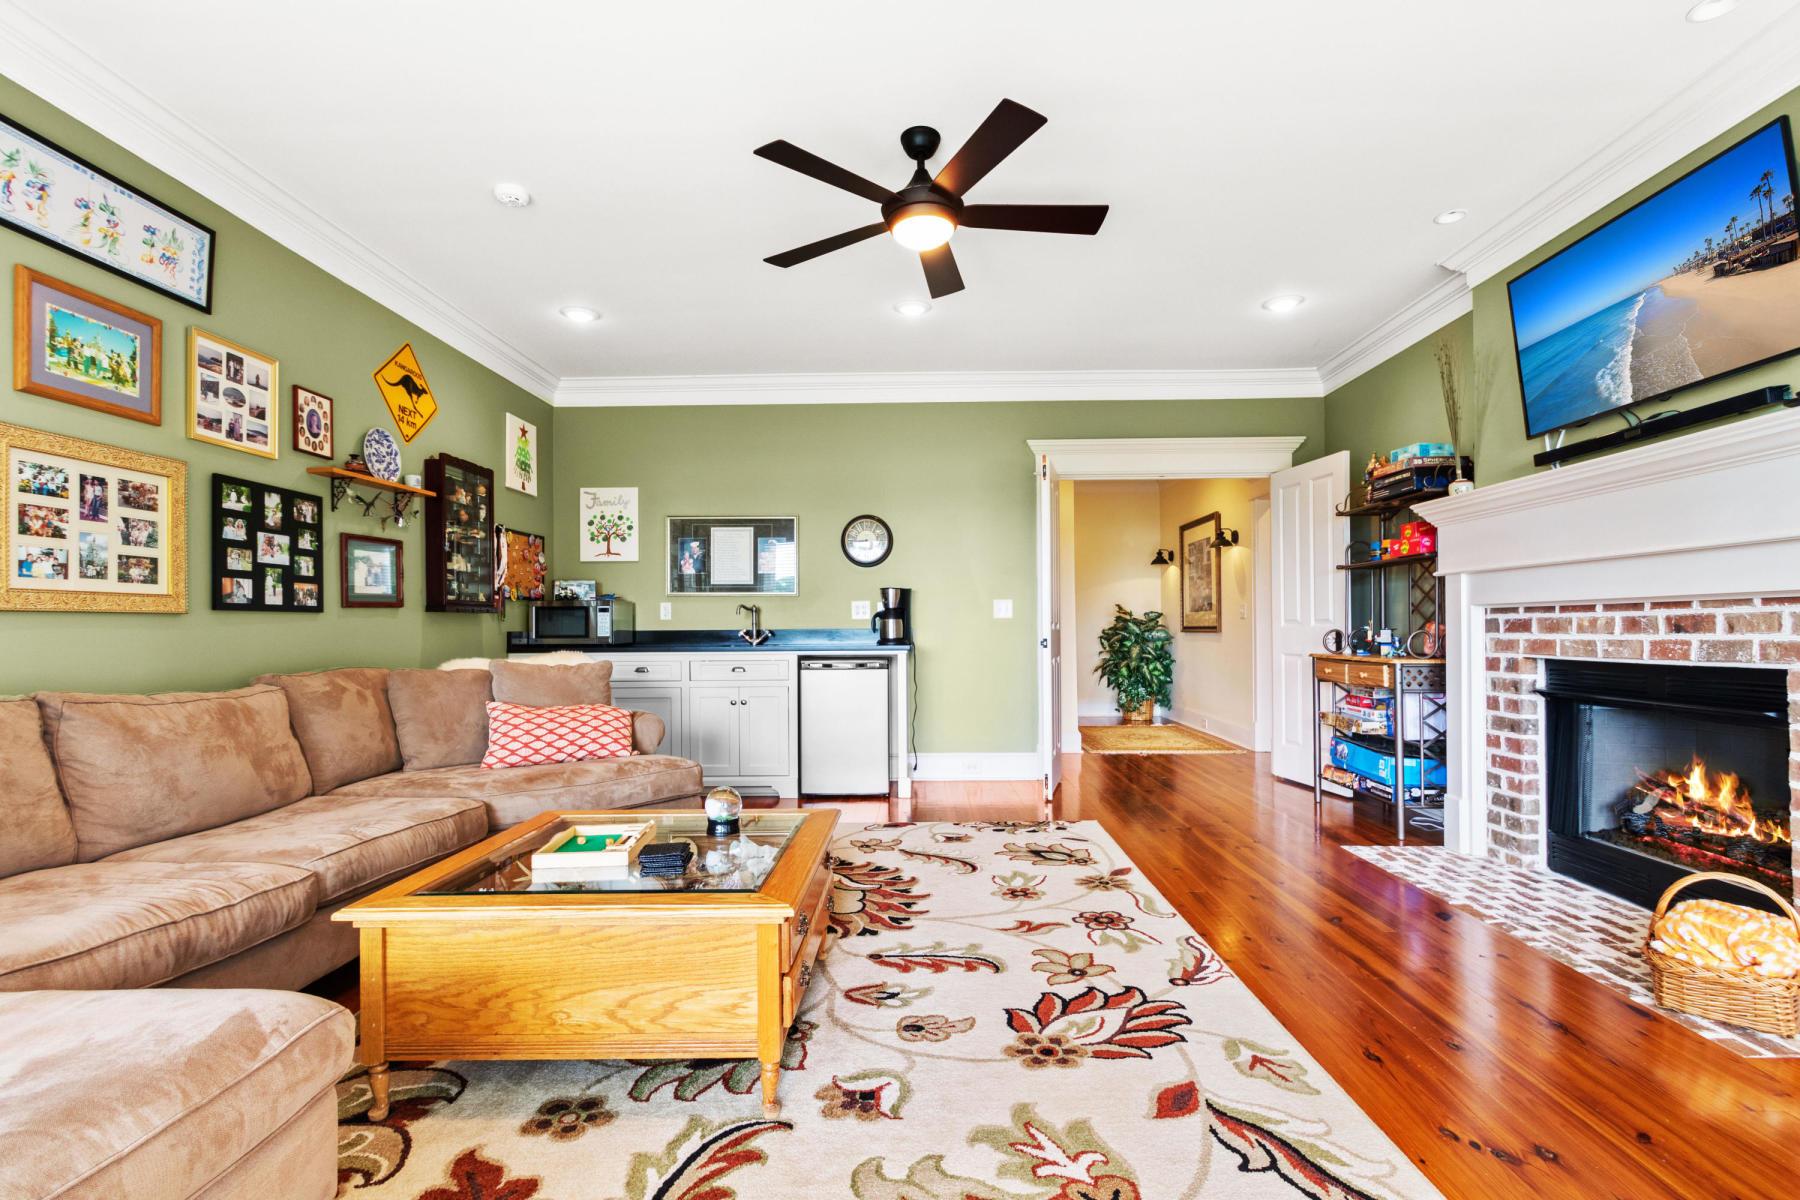 Broughton Hall Homes For Sale - 2058 Lakeshore, Pinopolis, SC - 4